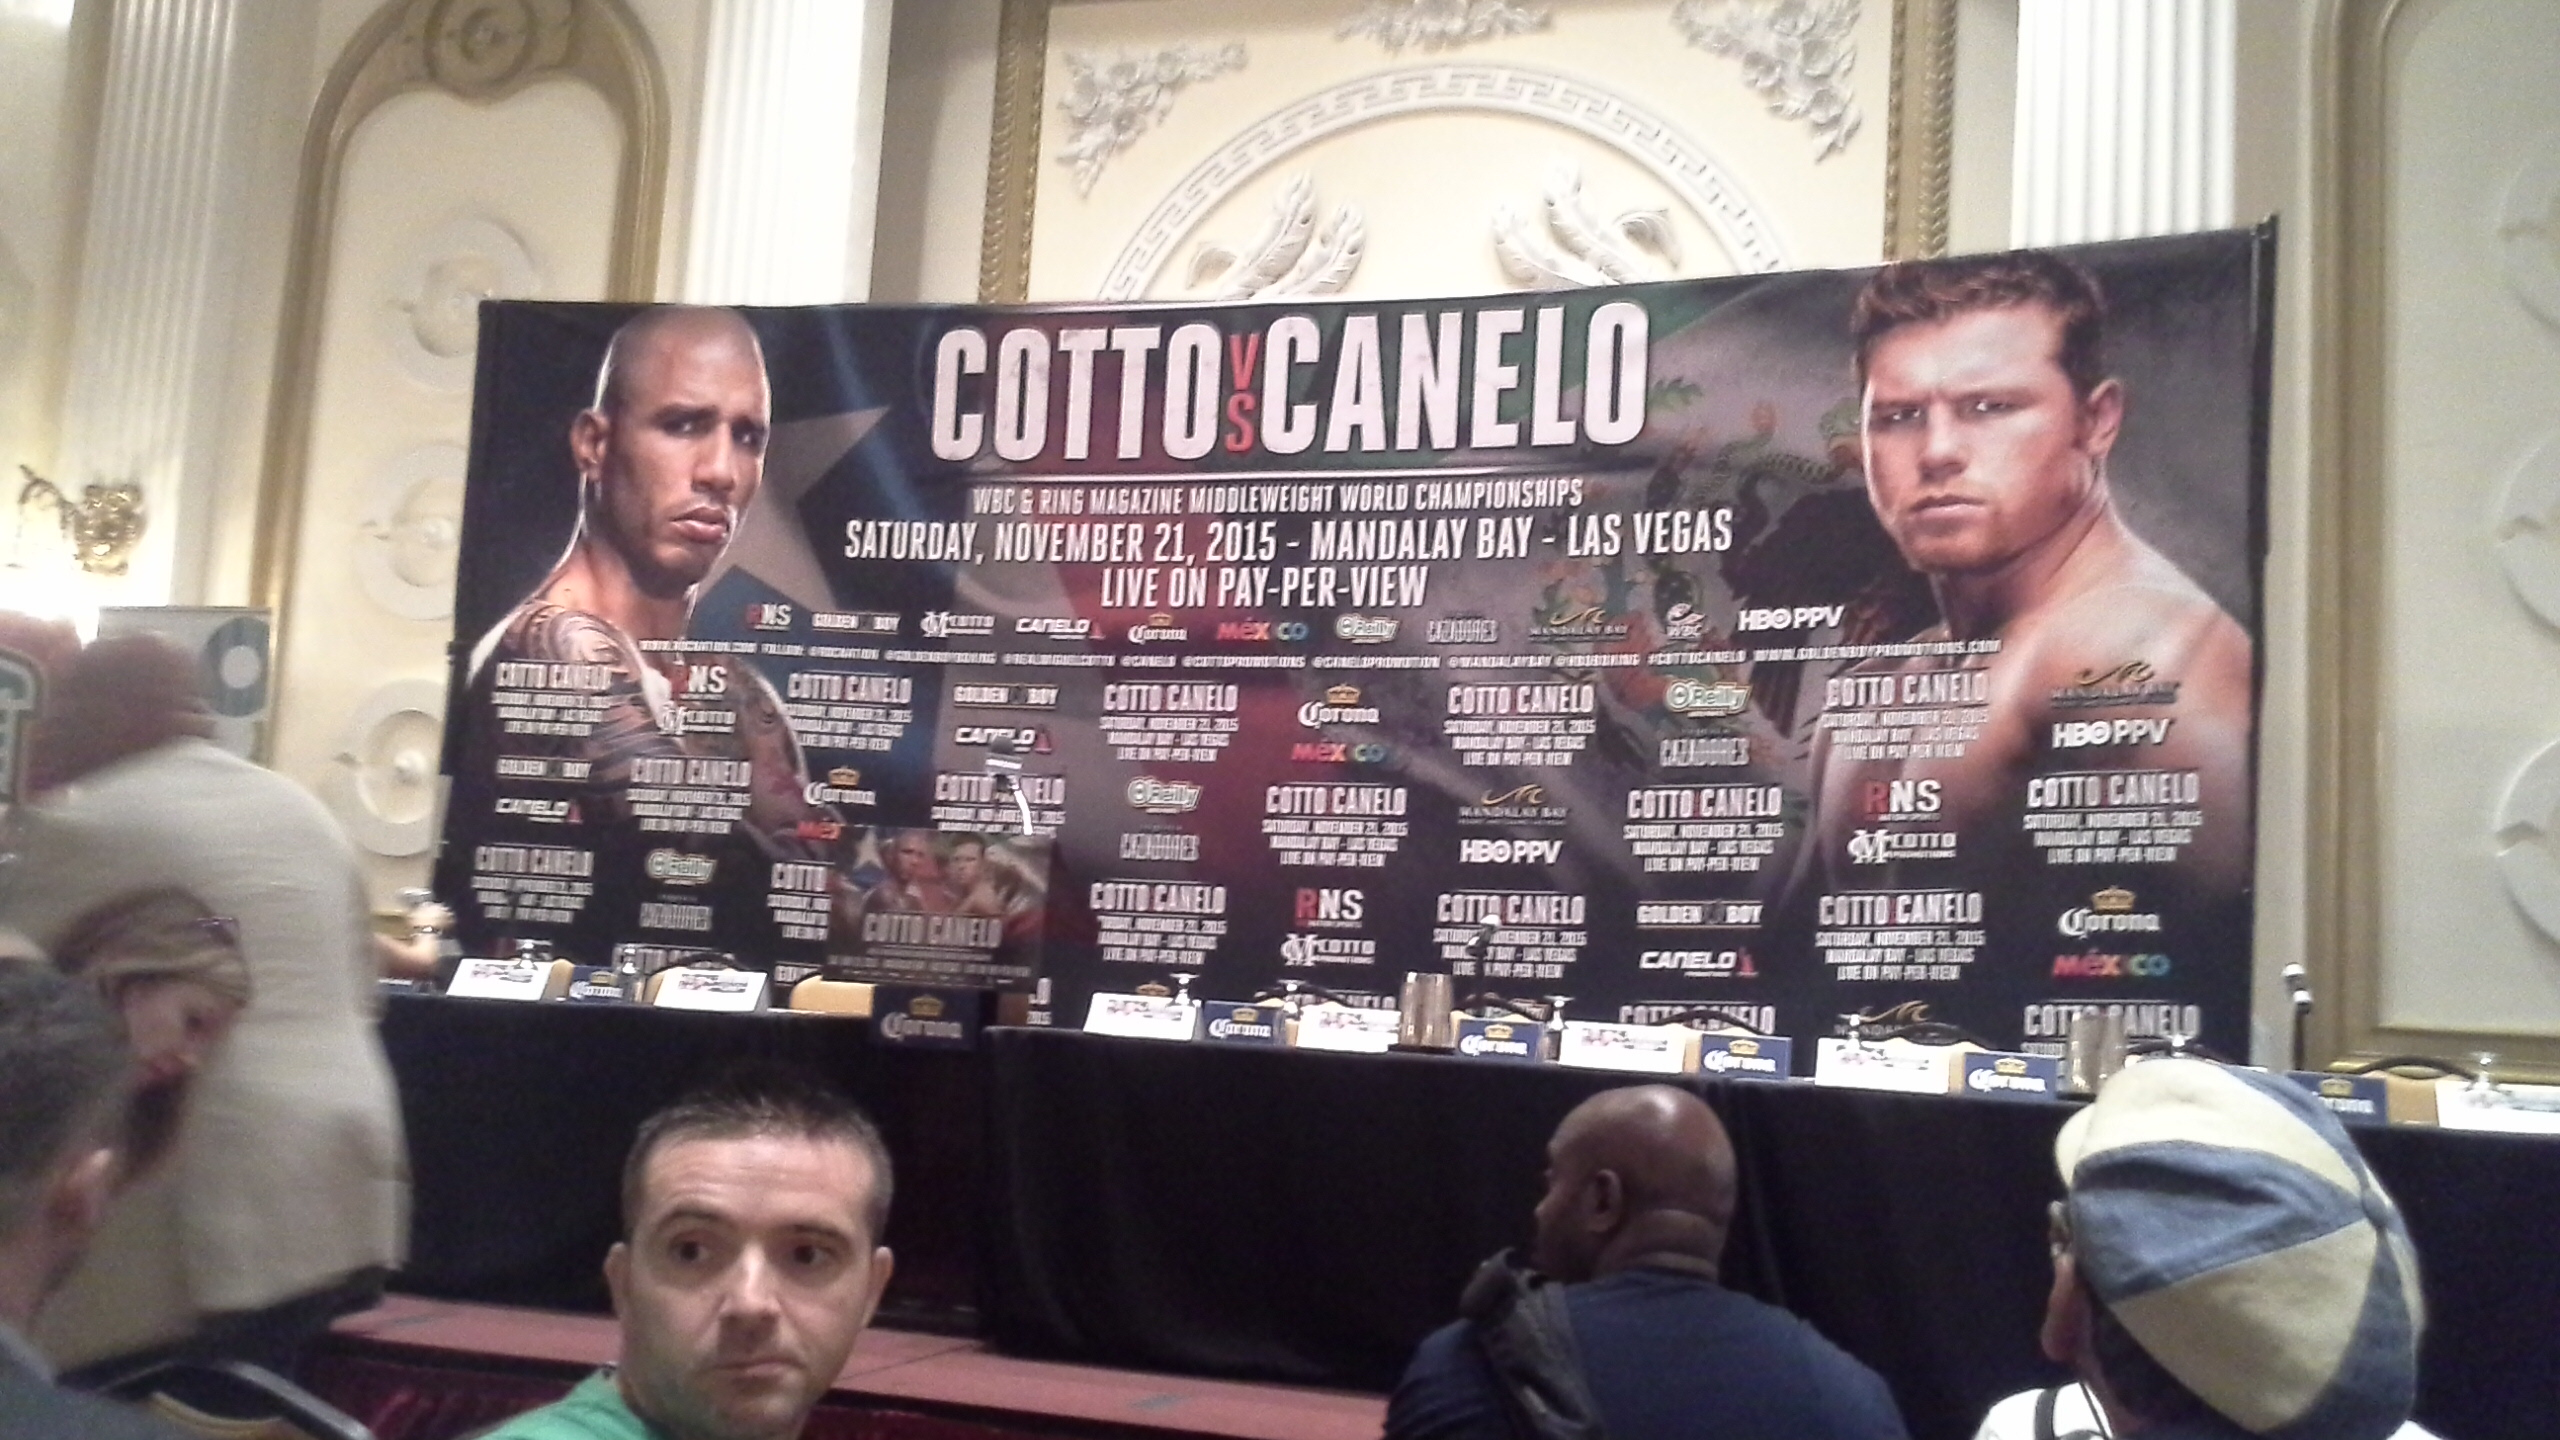 MEXICO MAKES VOICE HEARD AT COTTO-CANELO PRESS CONFERENCE